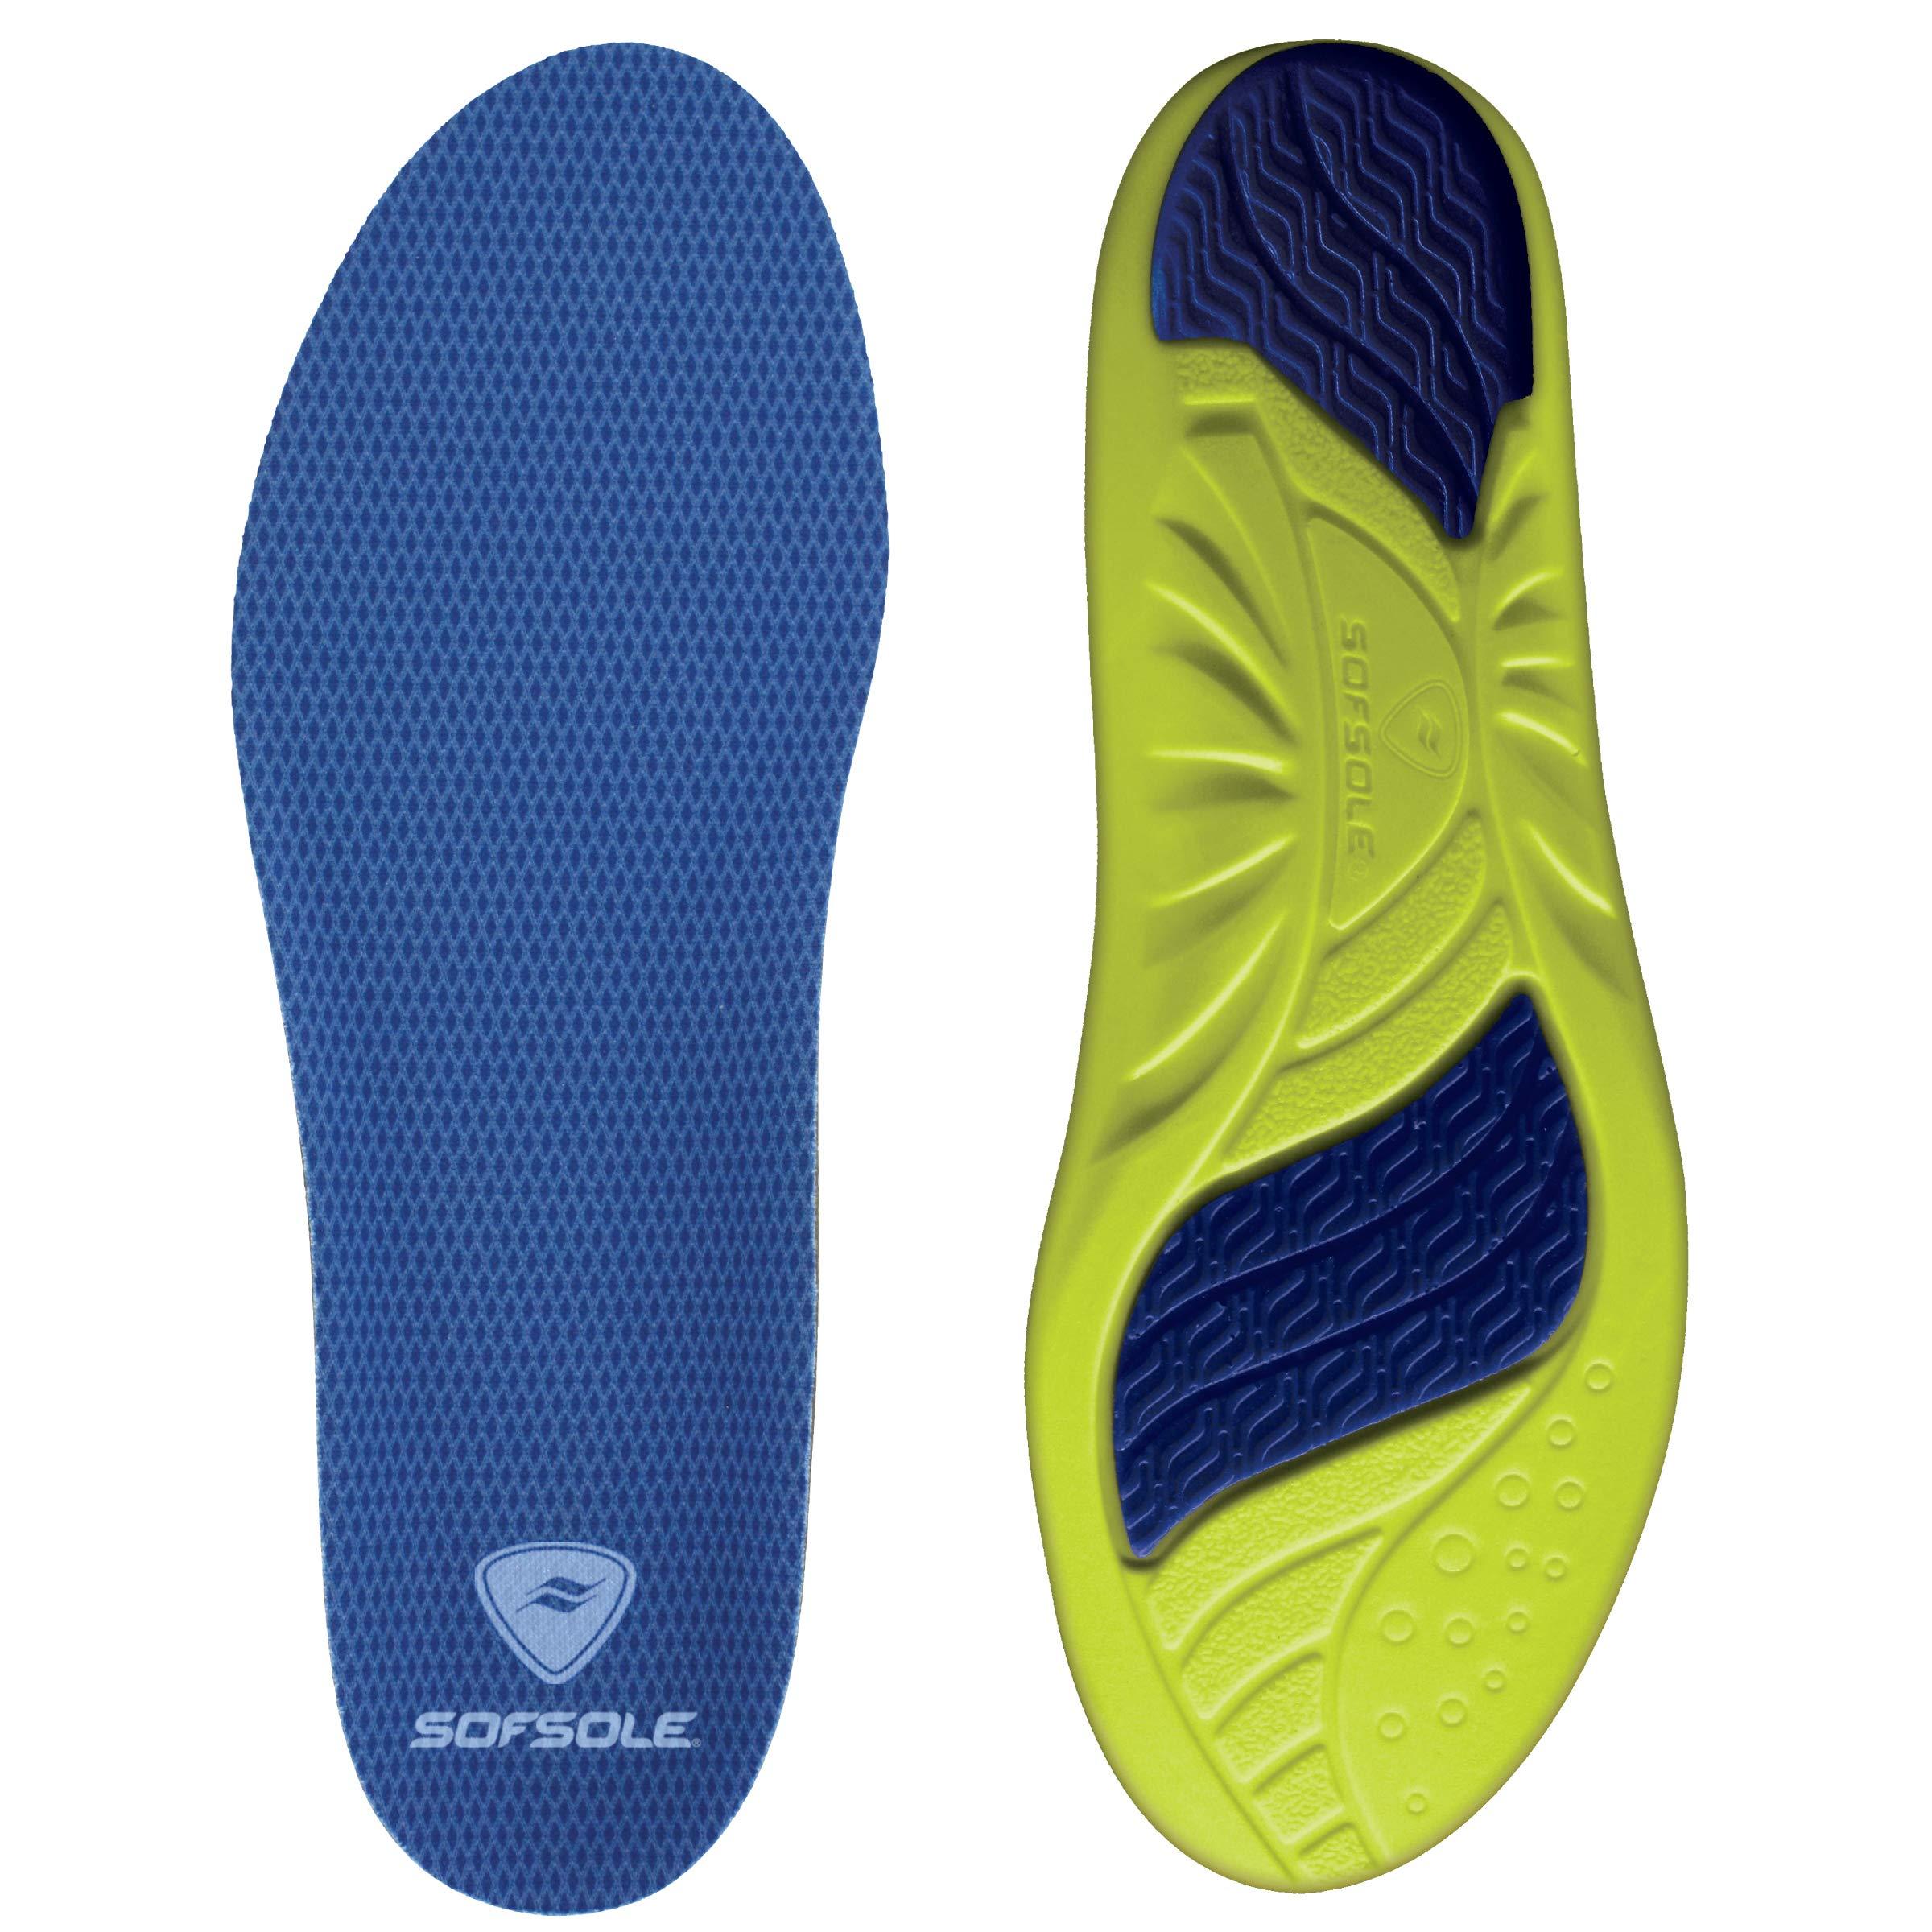 Sof Sole Insoles Women's Athlete Performance Full-Length Gel Shoe Insert, Women's Size 5-7.5 Blue